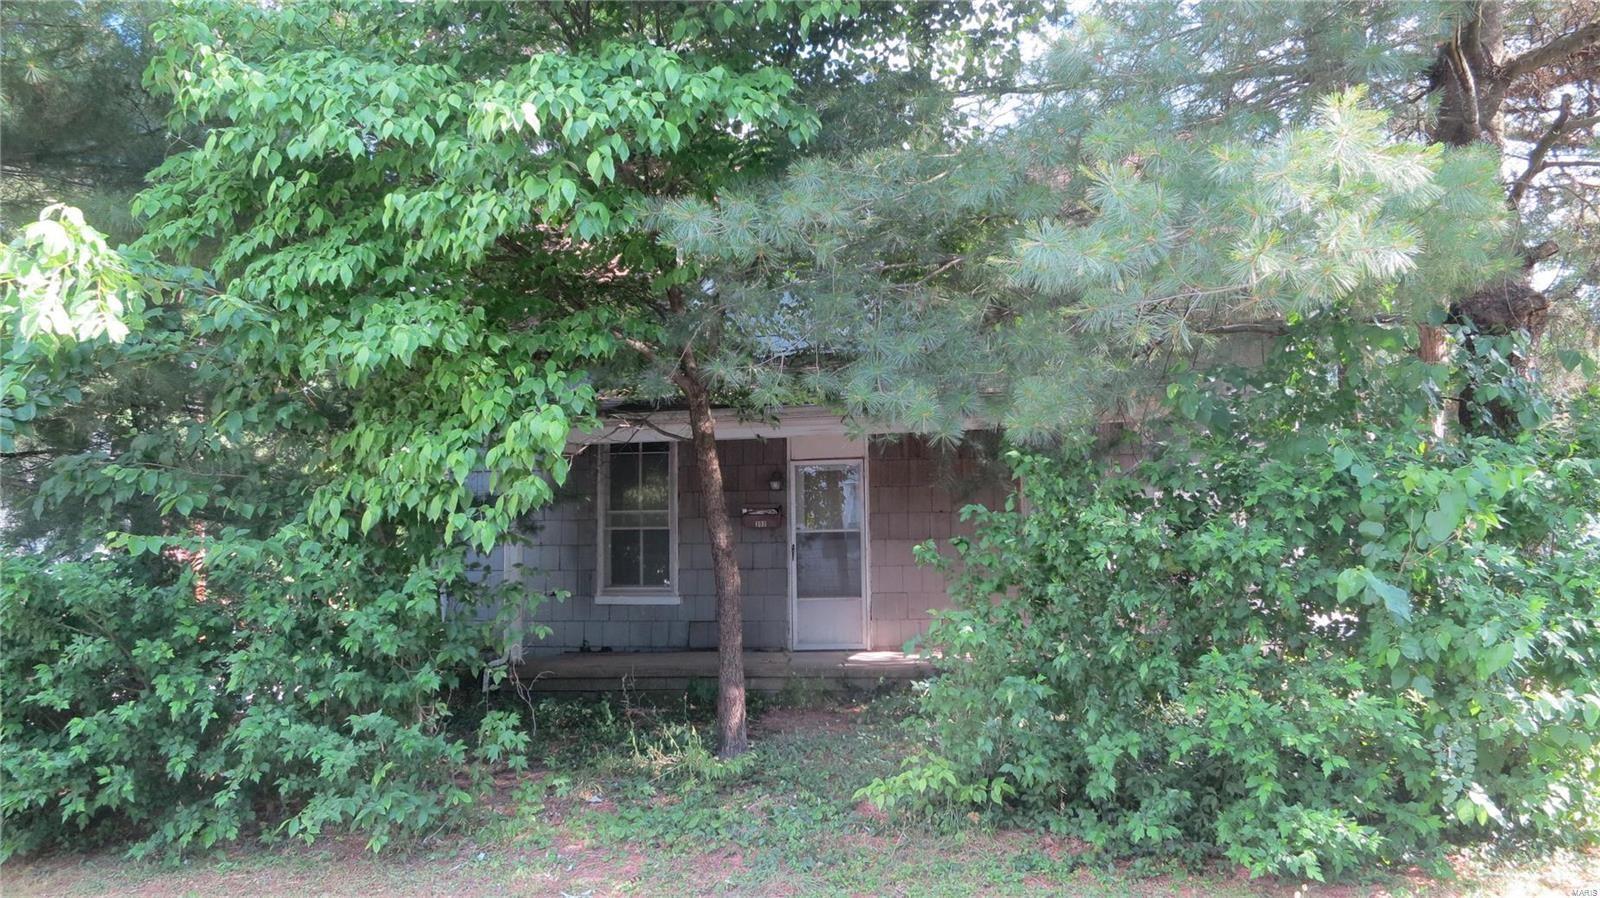 302 Short, Collinsville, IL 62234 - MLS#: 20043826